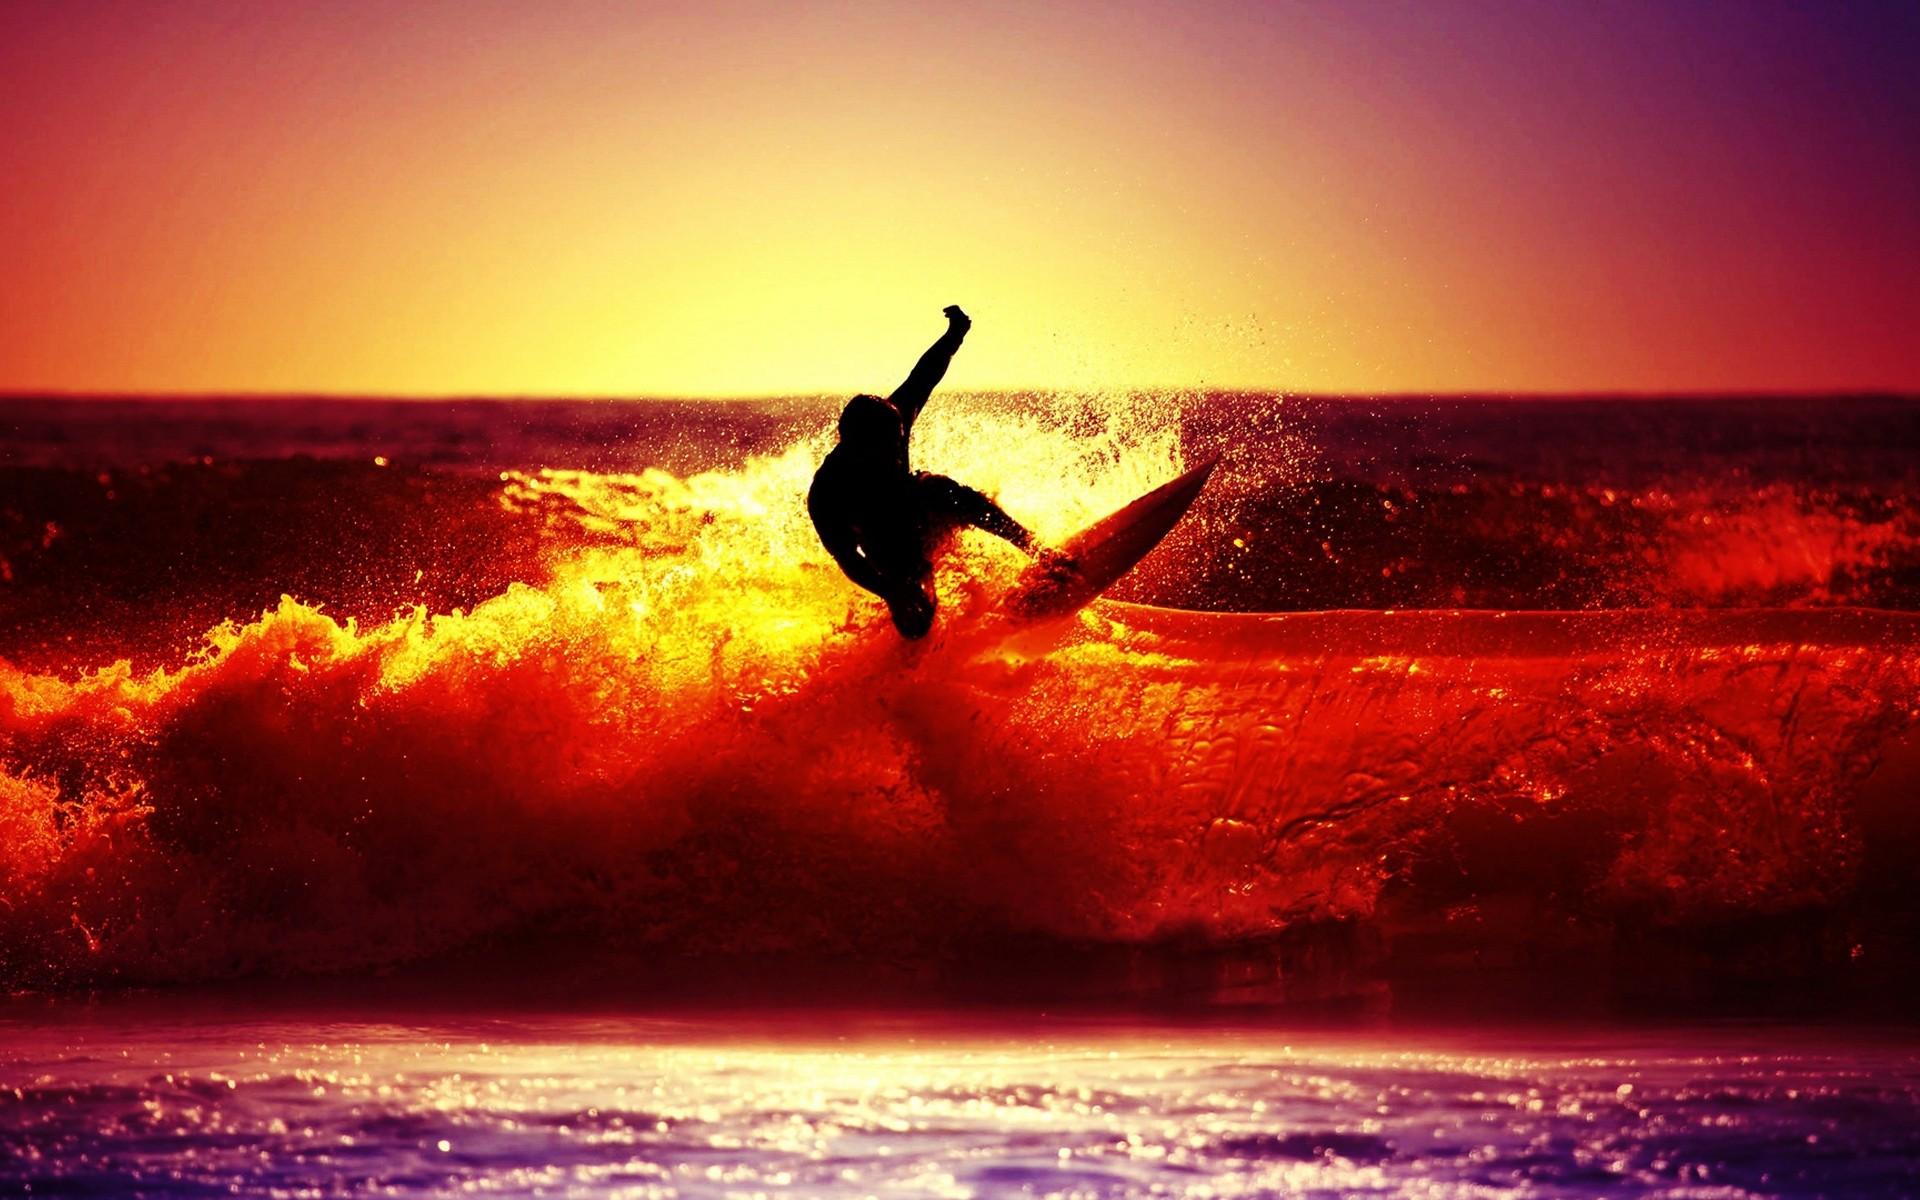 Surf al atardecer - 1920x1200